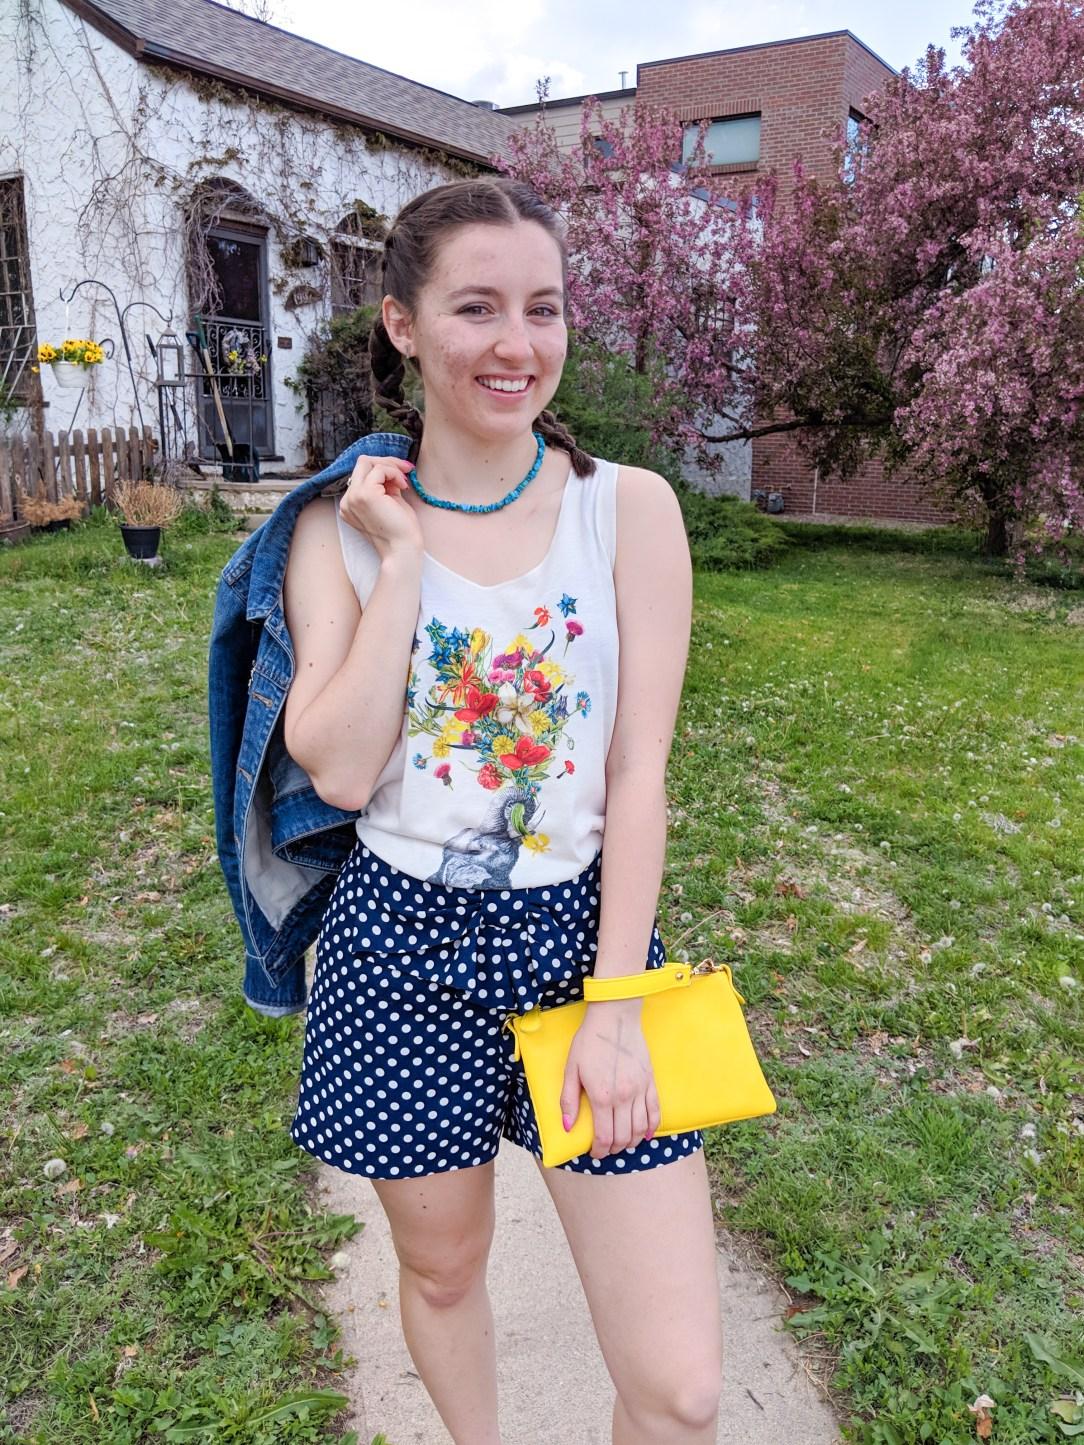 graphic tee, polka dot shorts, yellow purse, jean jacket